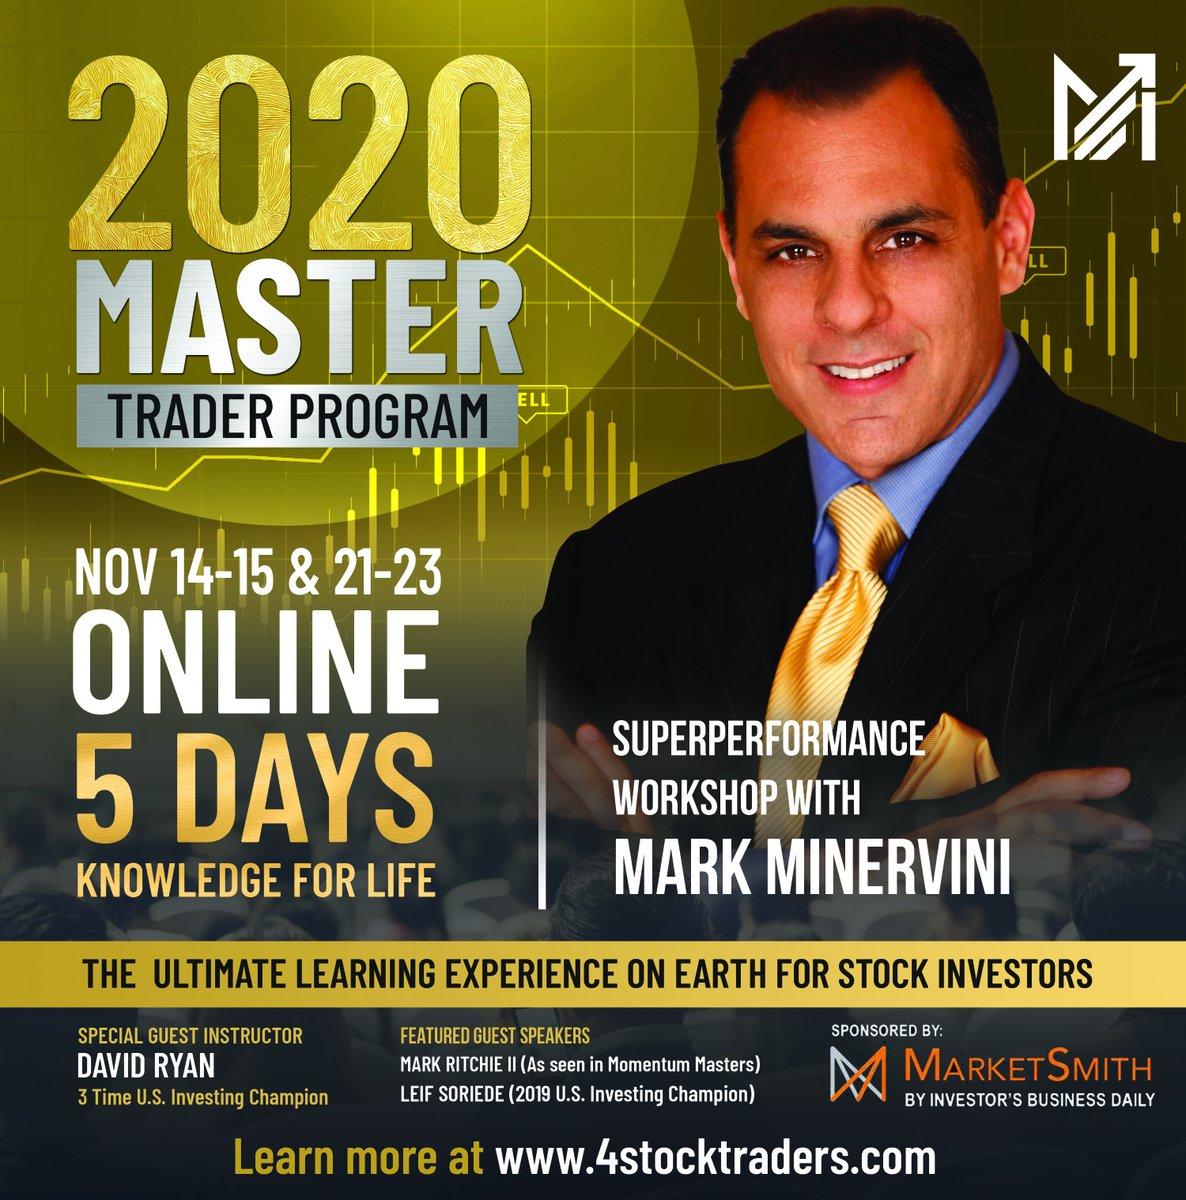 Mark Minervini – 5-Day Master Trader Program ONLINE EVENT